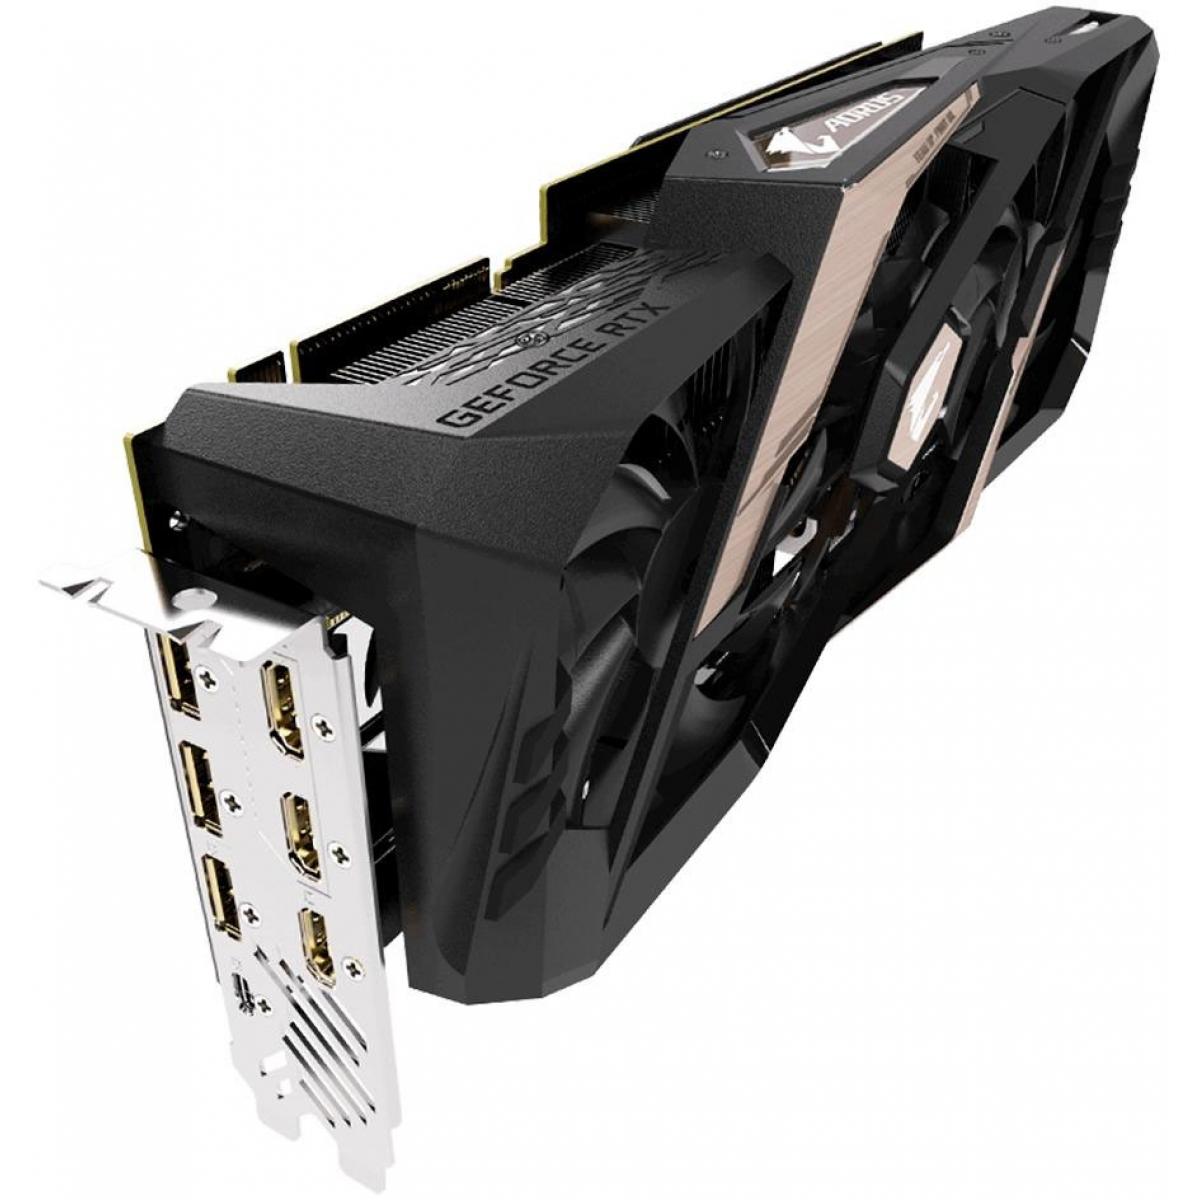 Placa de Video Gigabyte GeForce RTX 2080 Aorus, 8GB GDDR6, 256Bit